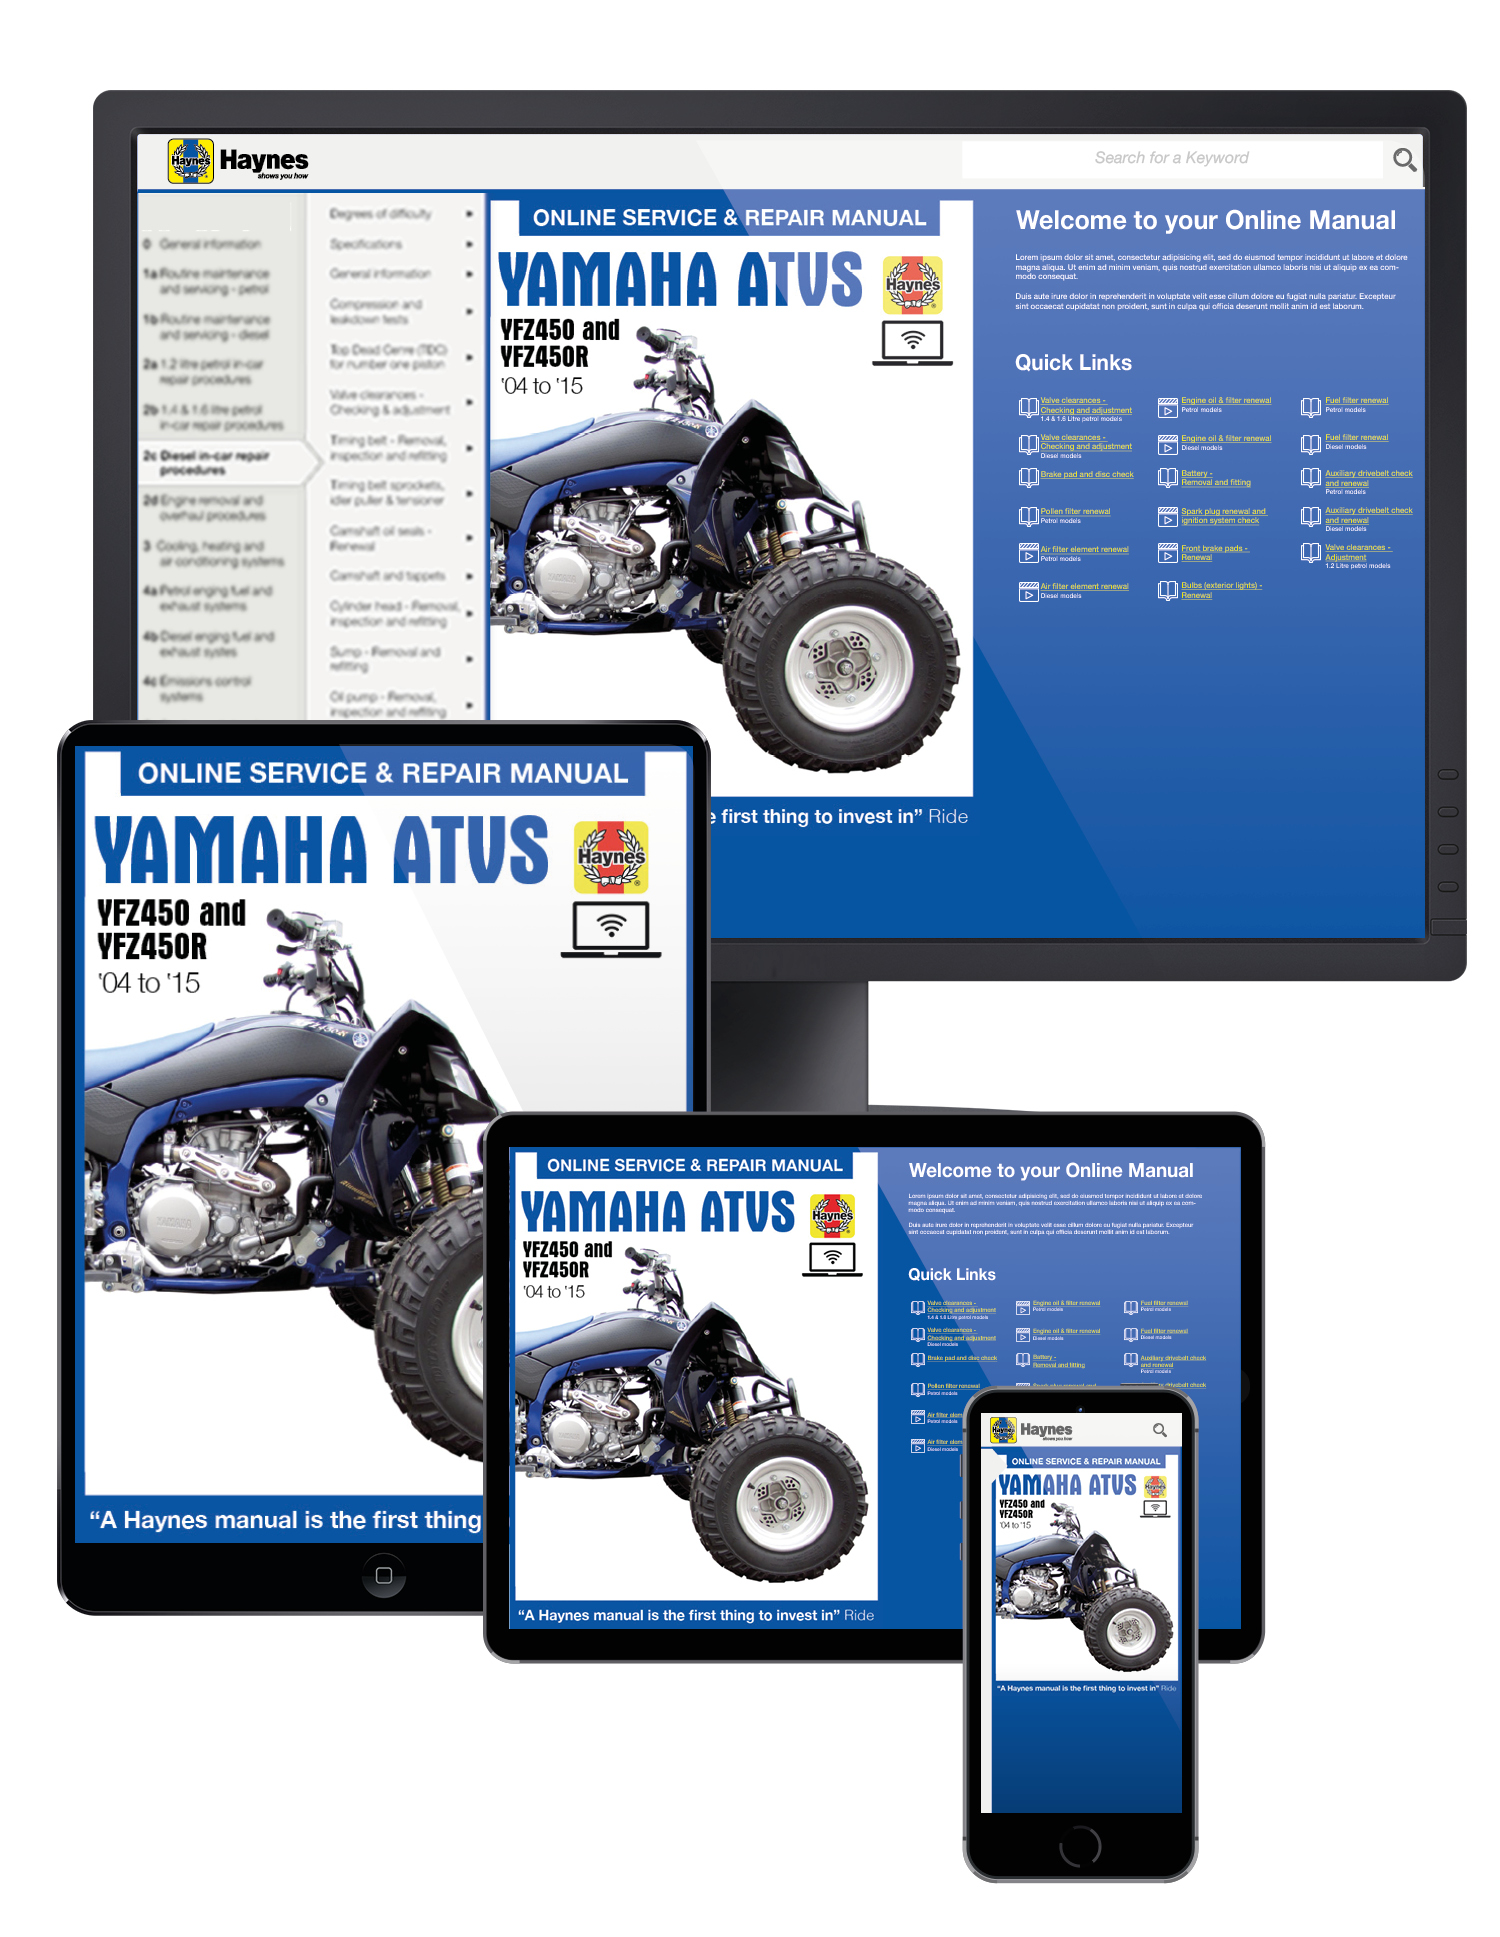 Yfz450 Haynes Publishing 04 Yfz 450 Wiring Schematic Diagram Online Manual Enlarge Yamaha